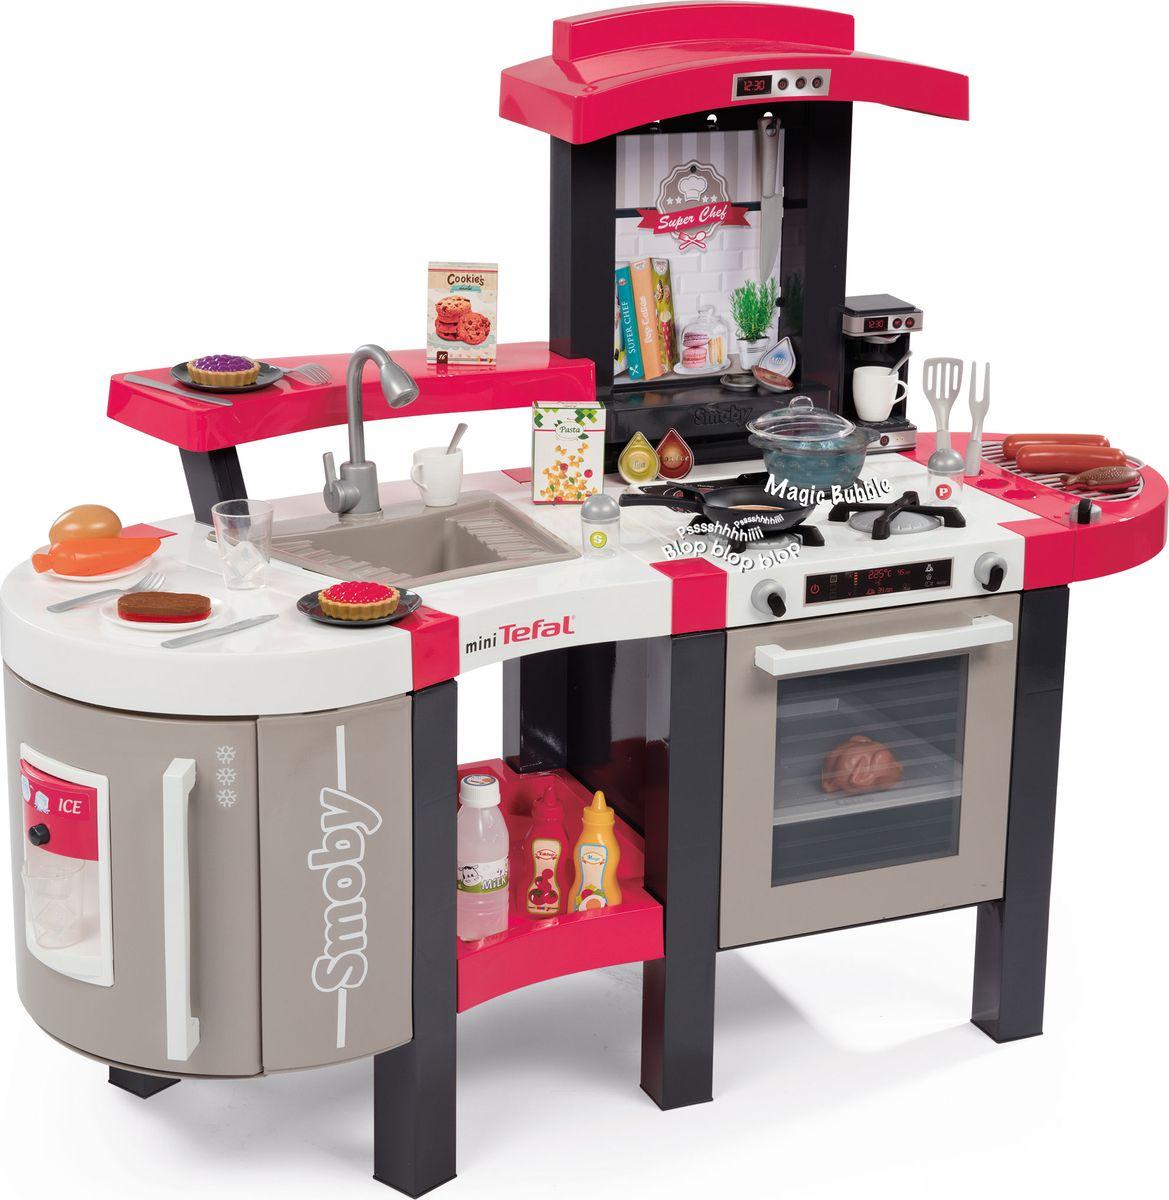 Smoby Игровой набор Кухня Tefal Super Chef Deluxe smoby кухня электронная tefal super chef deluxe звук пузырьки 46 аксессуаров 311304